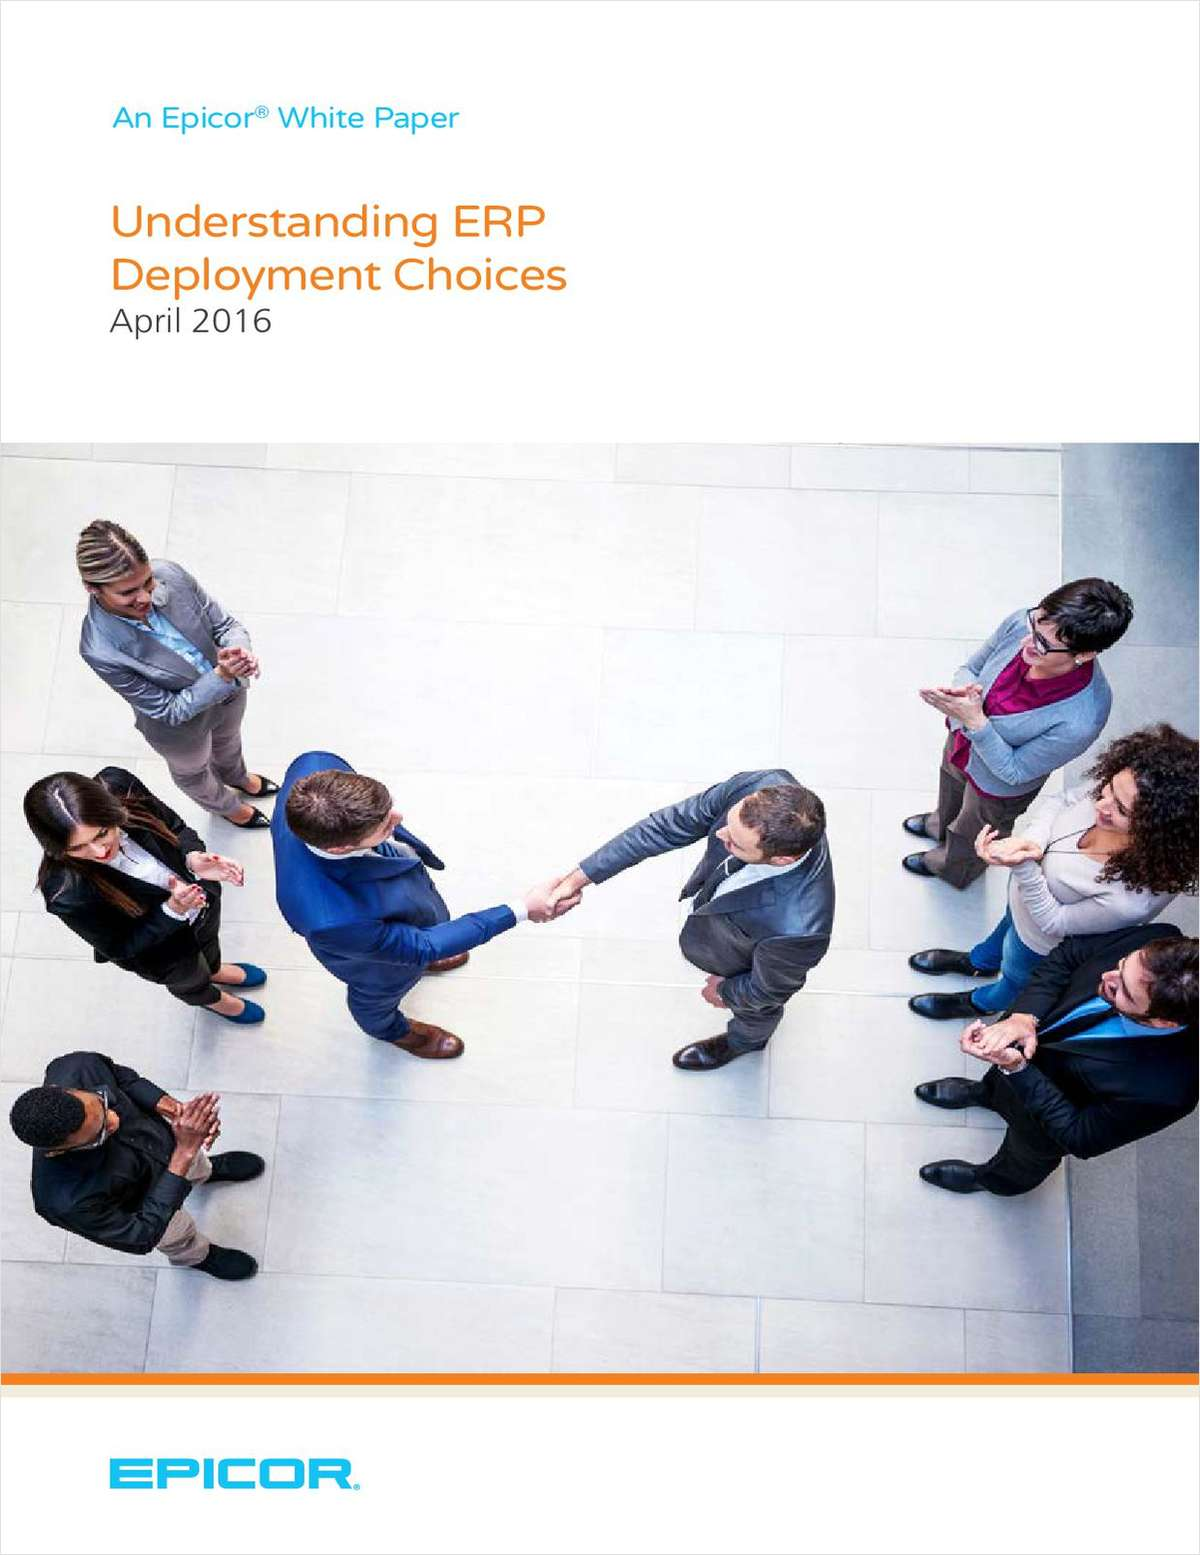 Understanding ERP Deployment Choices